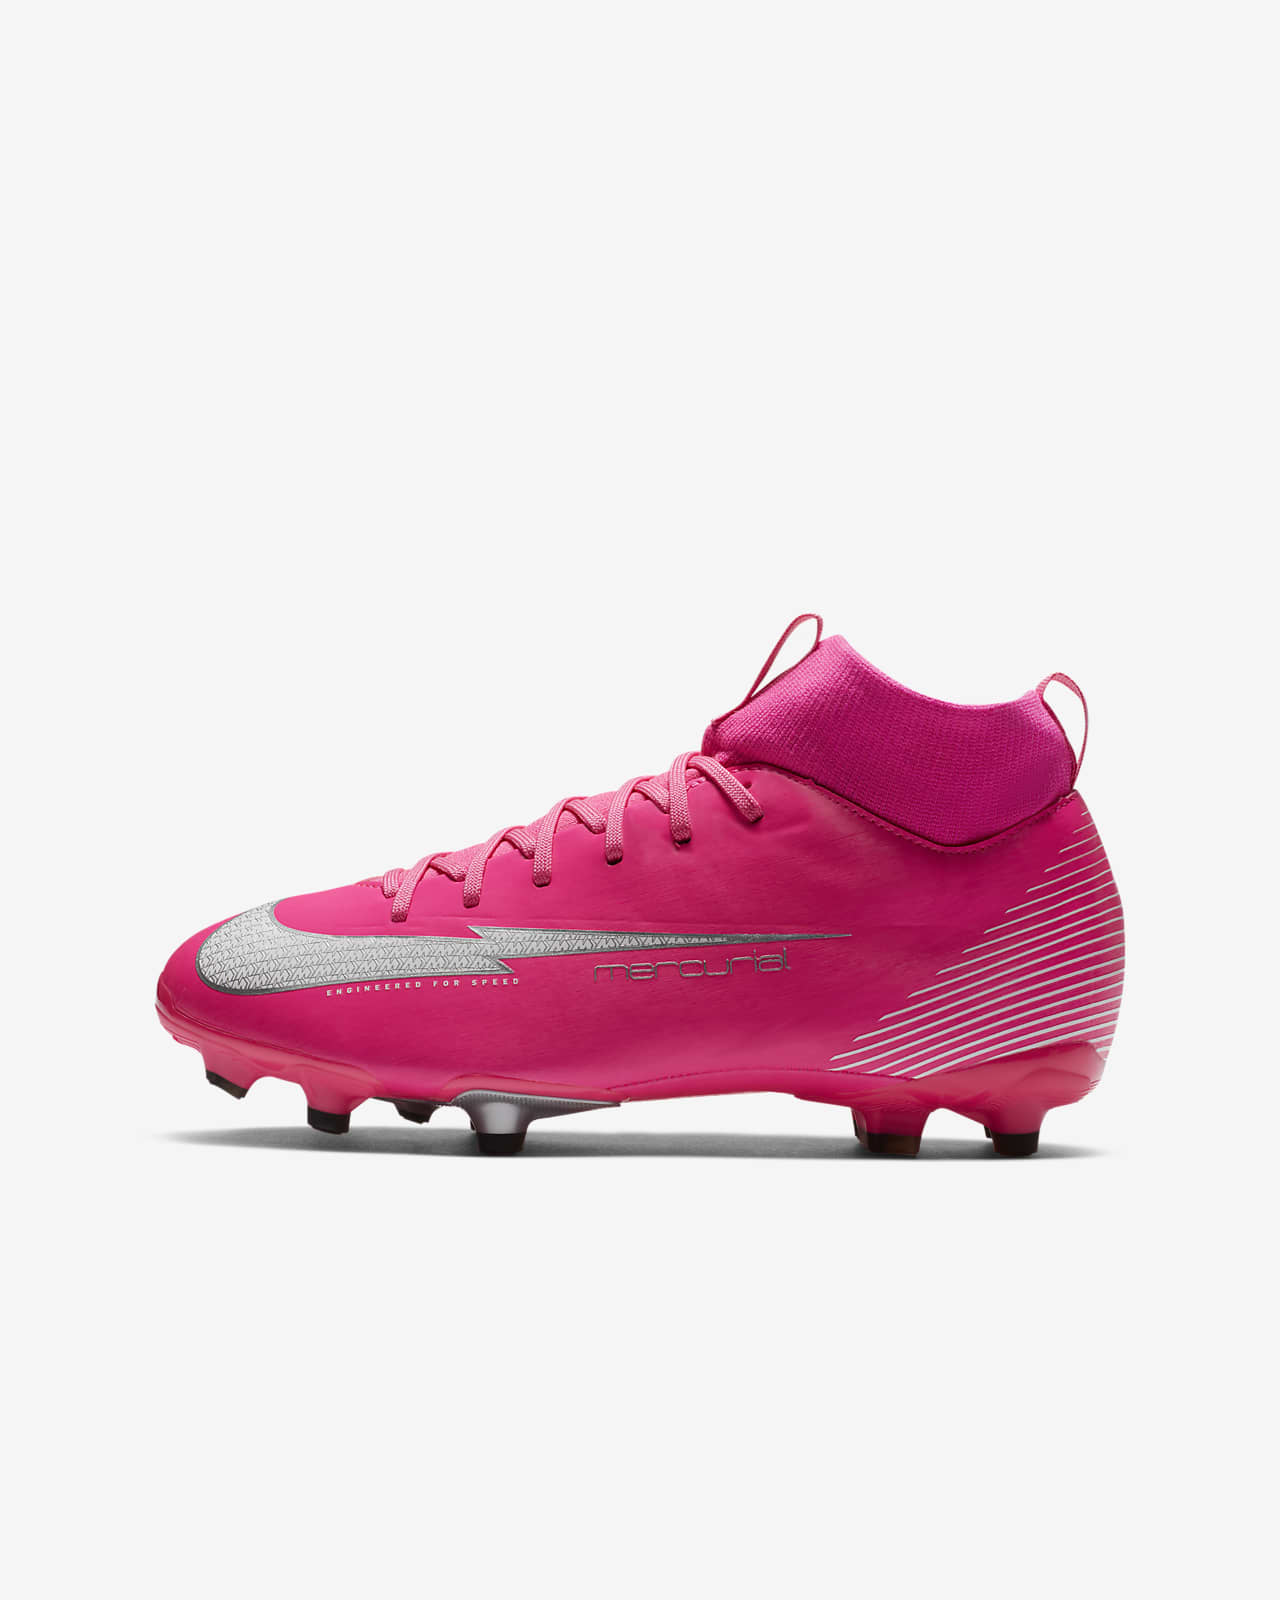 Nike Jr. Mercurial Superfly 7 Academy MG Botas de fútbol multisuperficie - Niño/a y niño/a pequeño/a